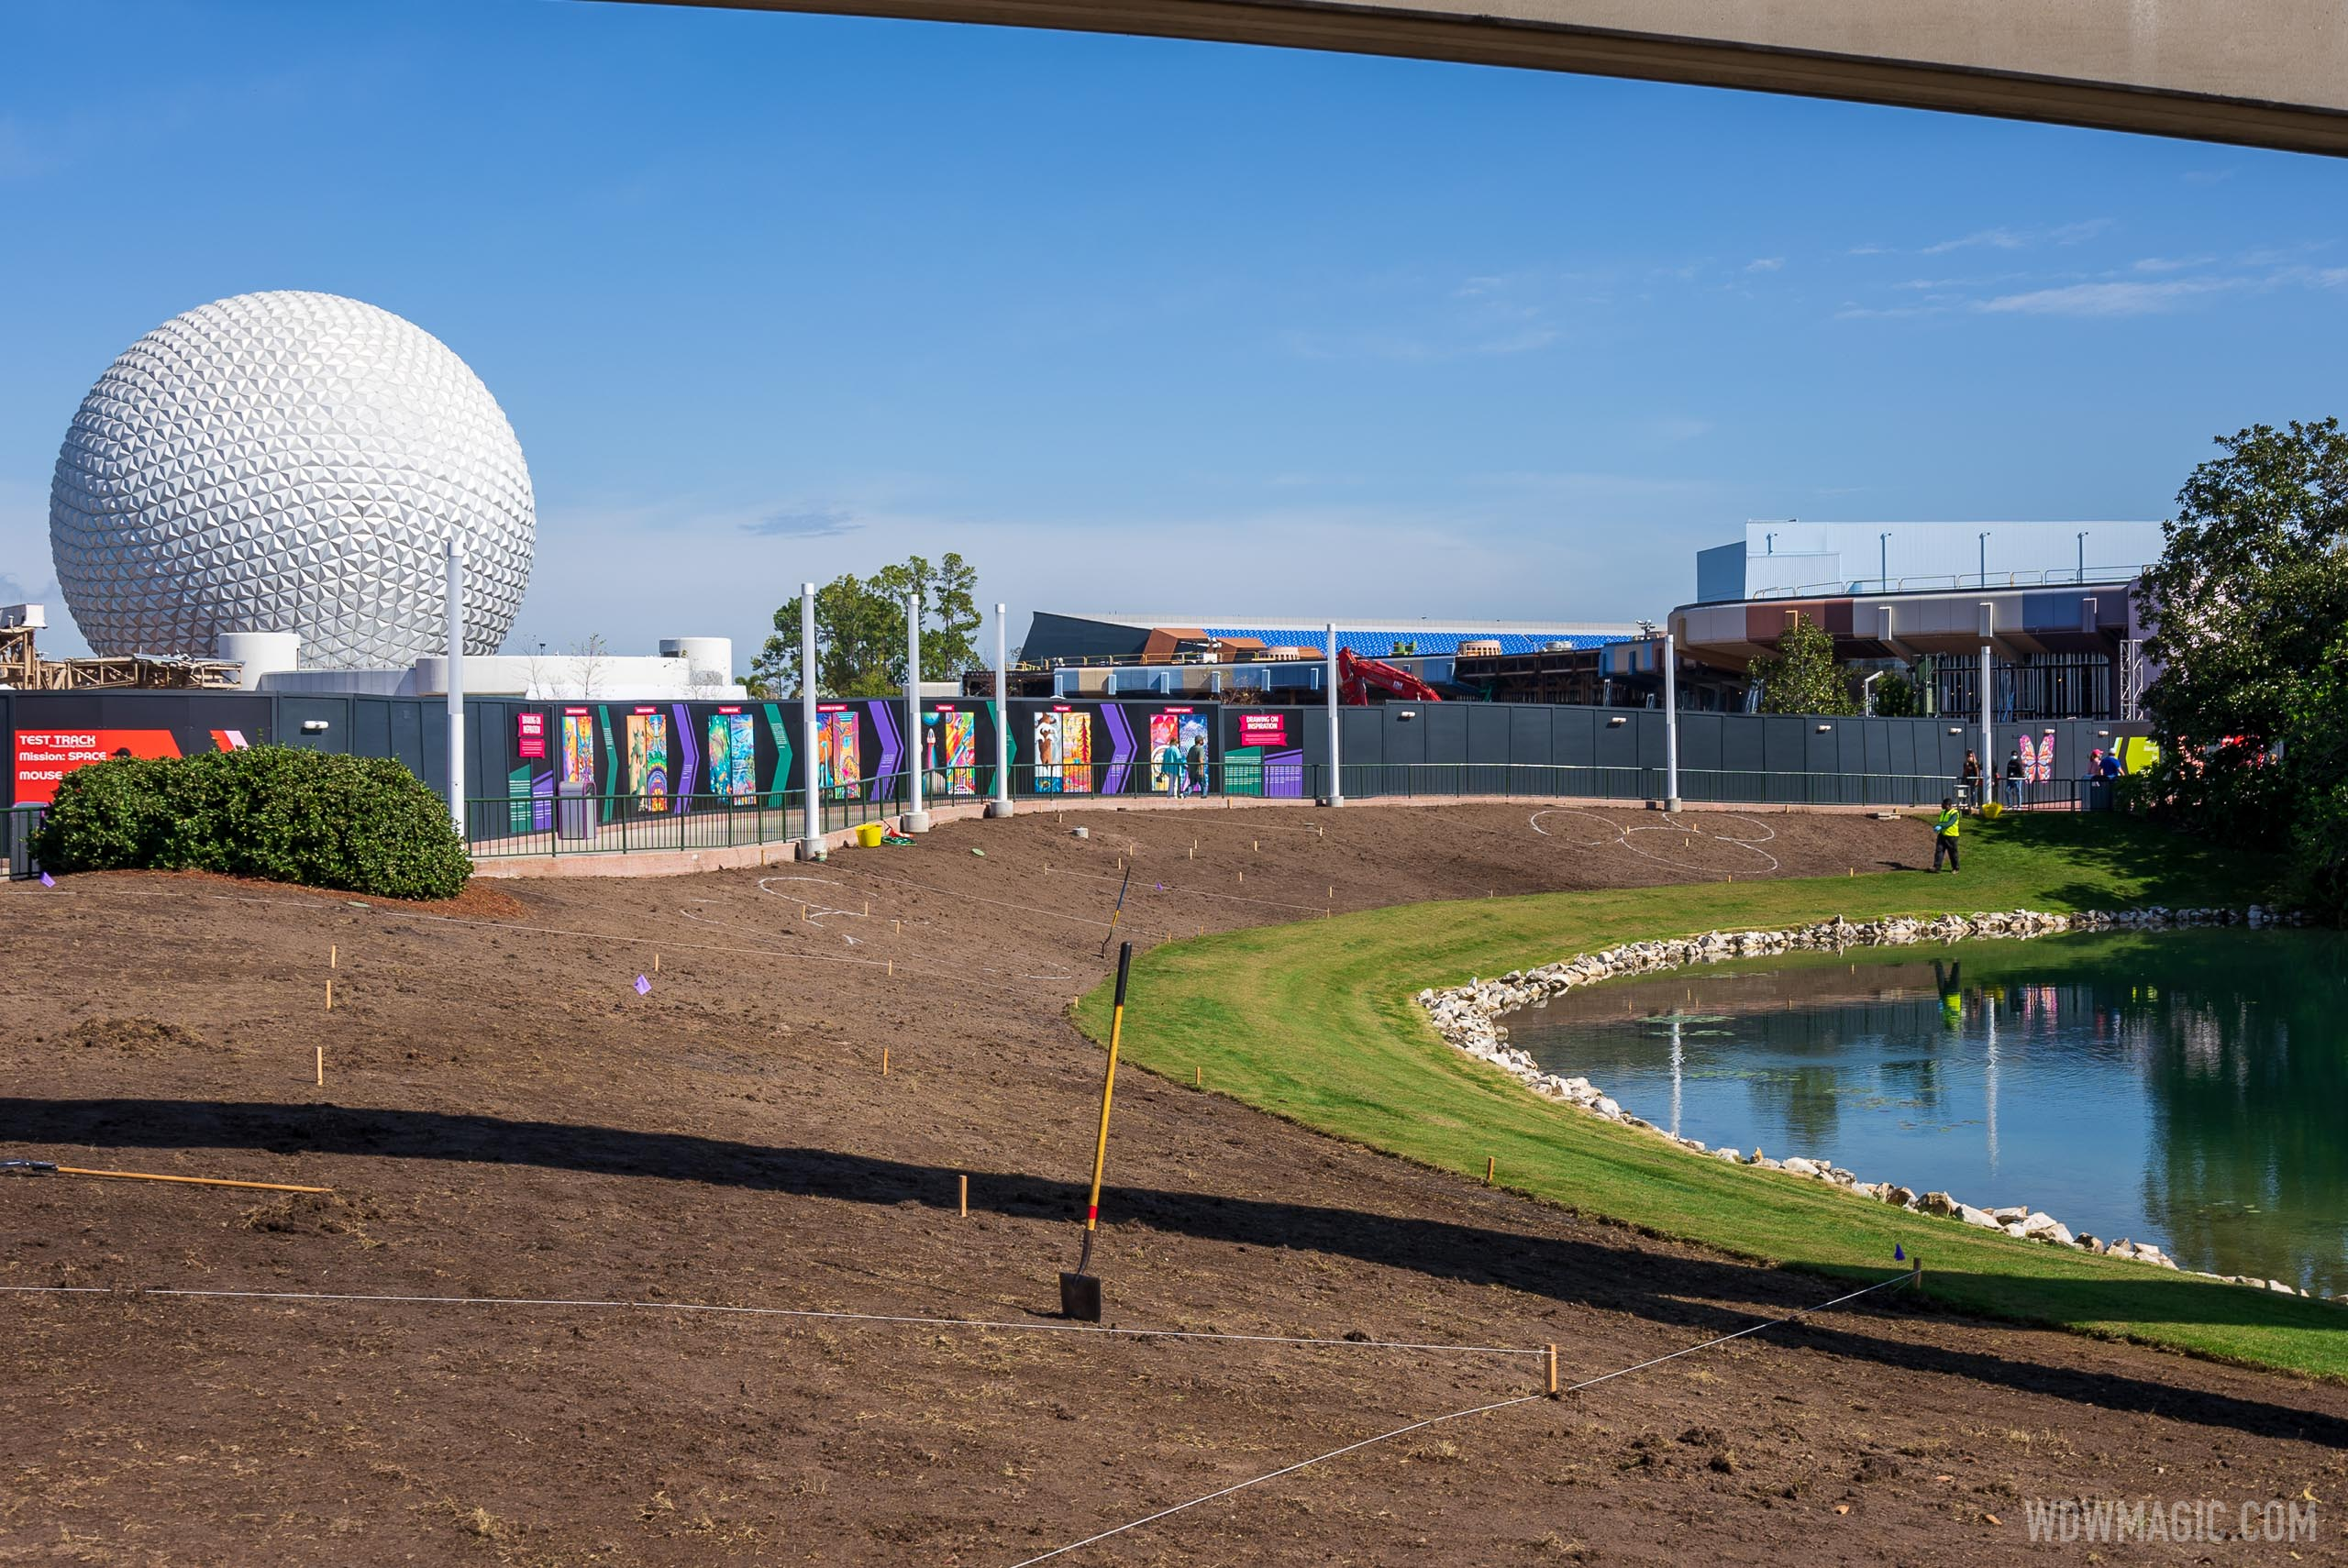 2021 Taste of EPCOT International Flower and Garden Festival preparations